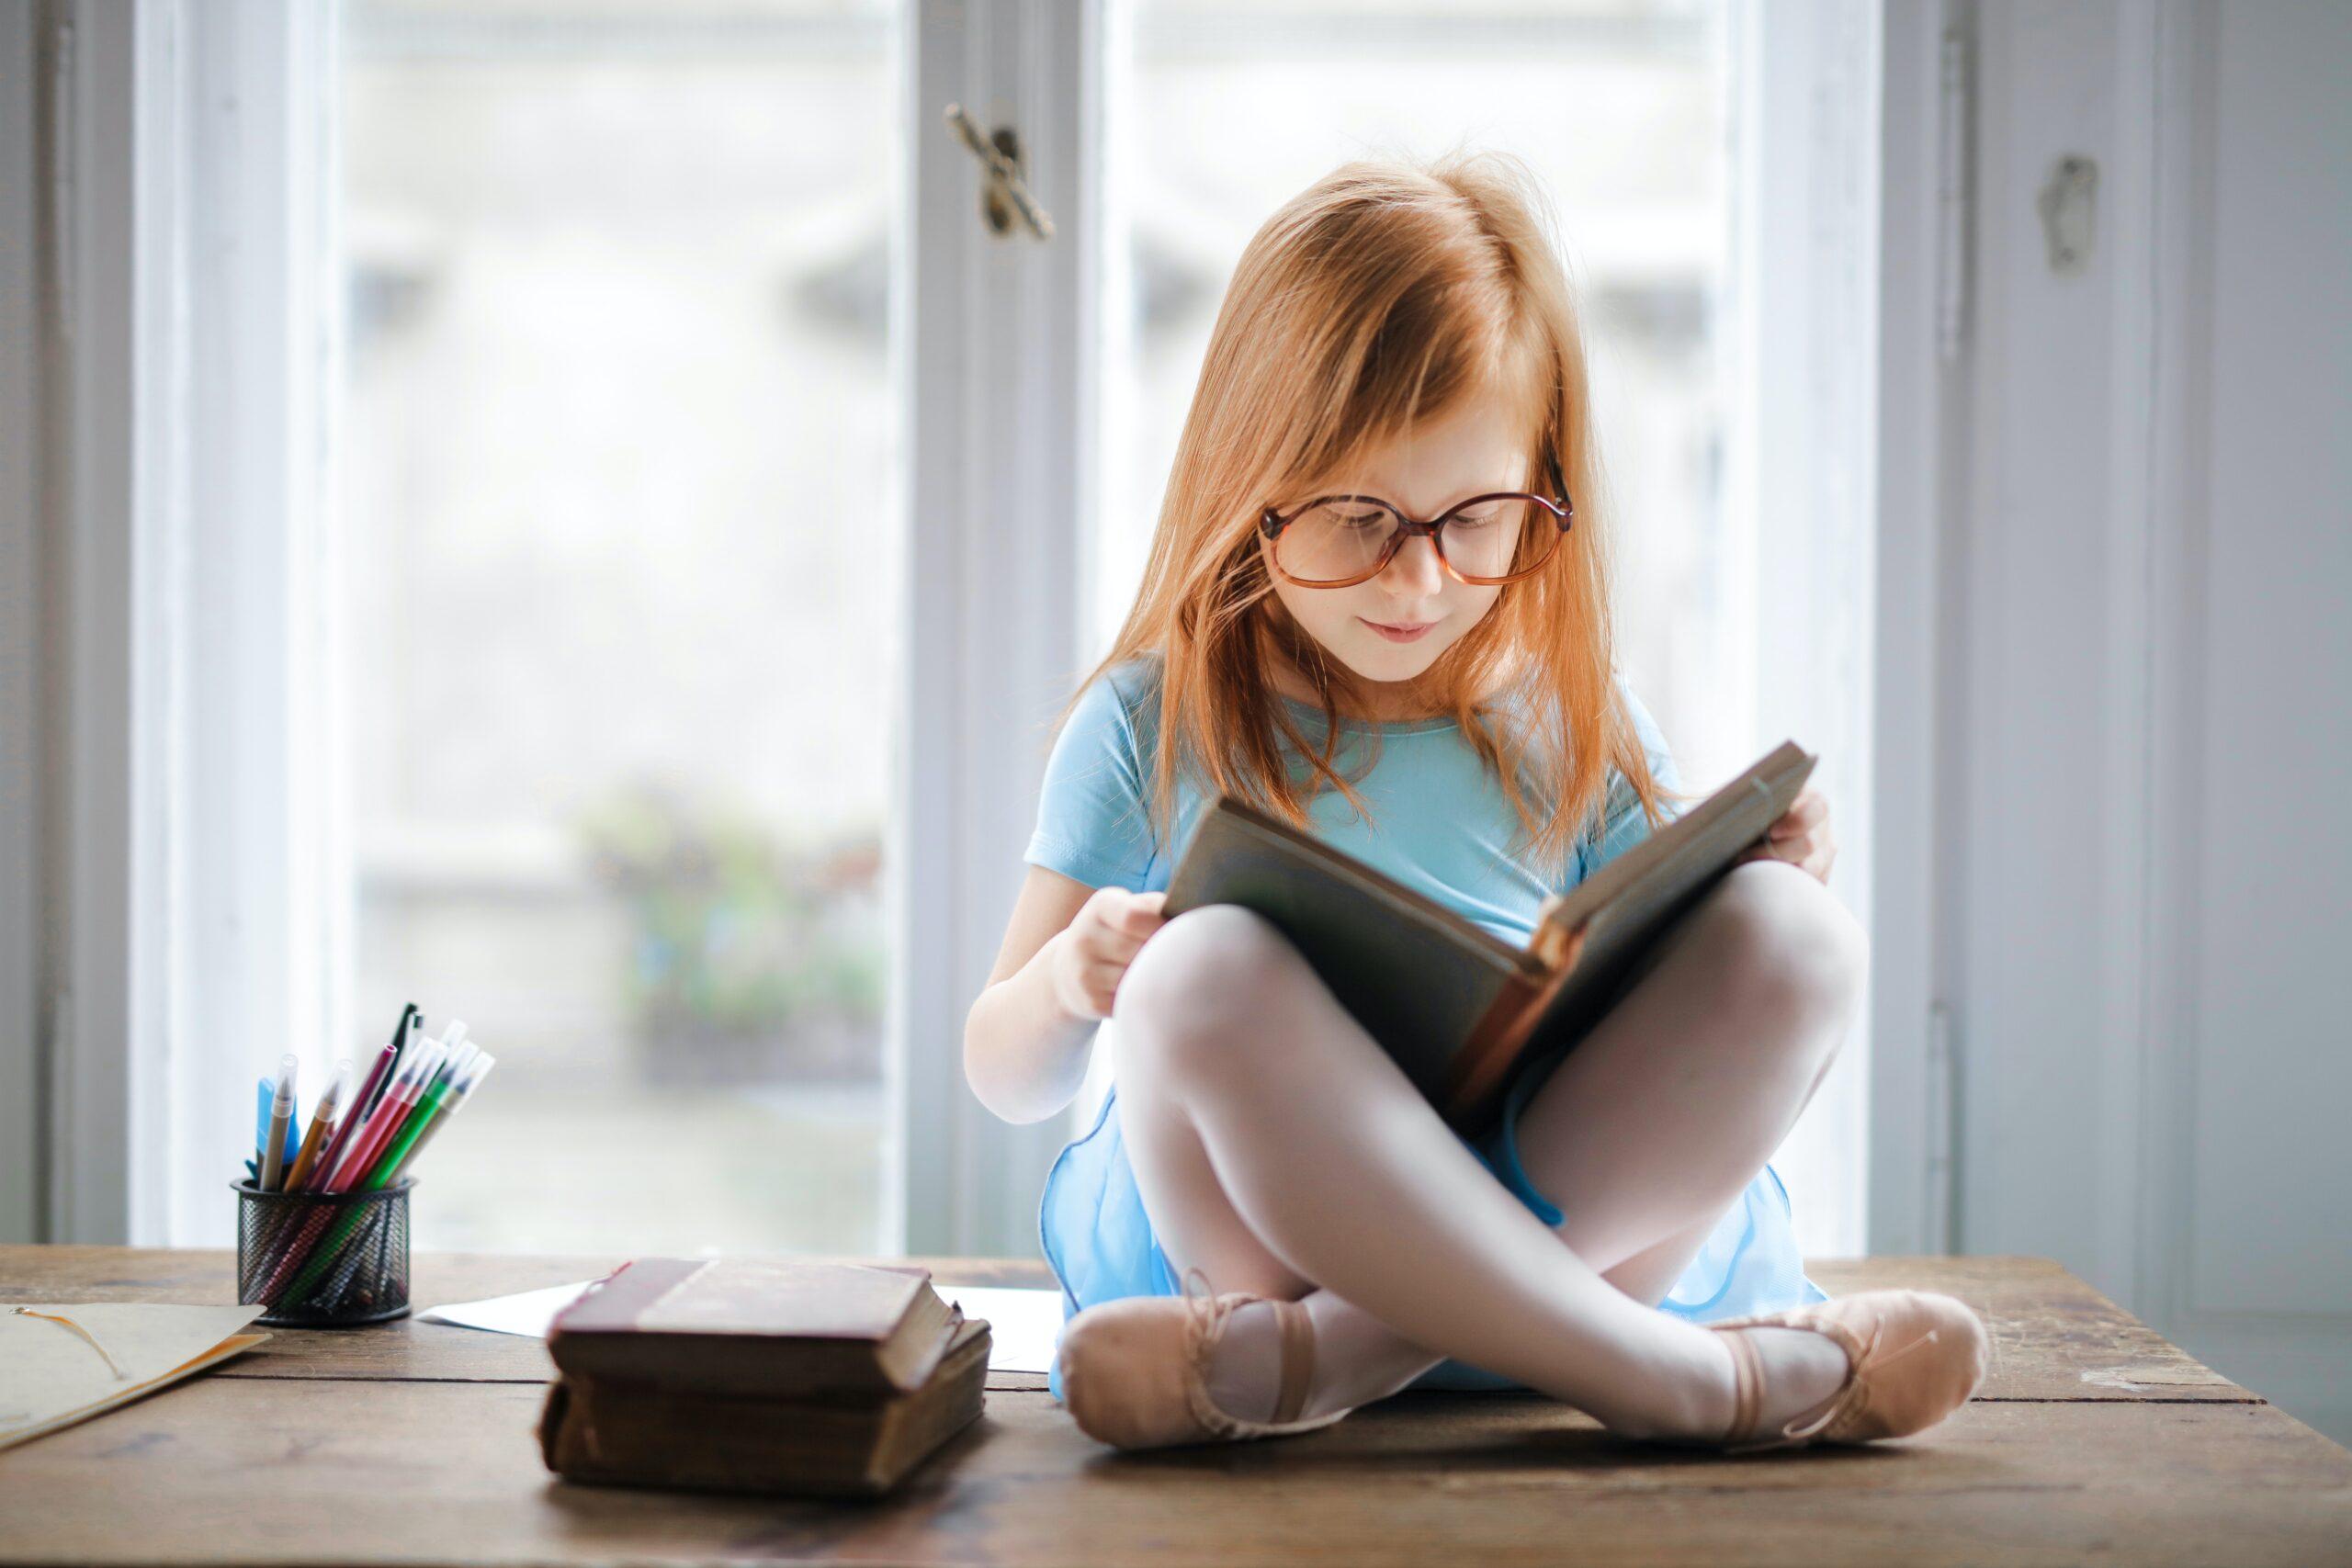 Little girl sat in a window reading a book